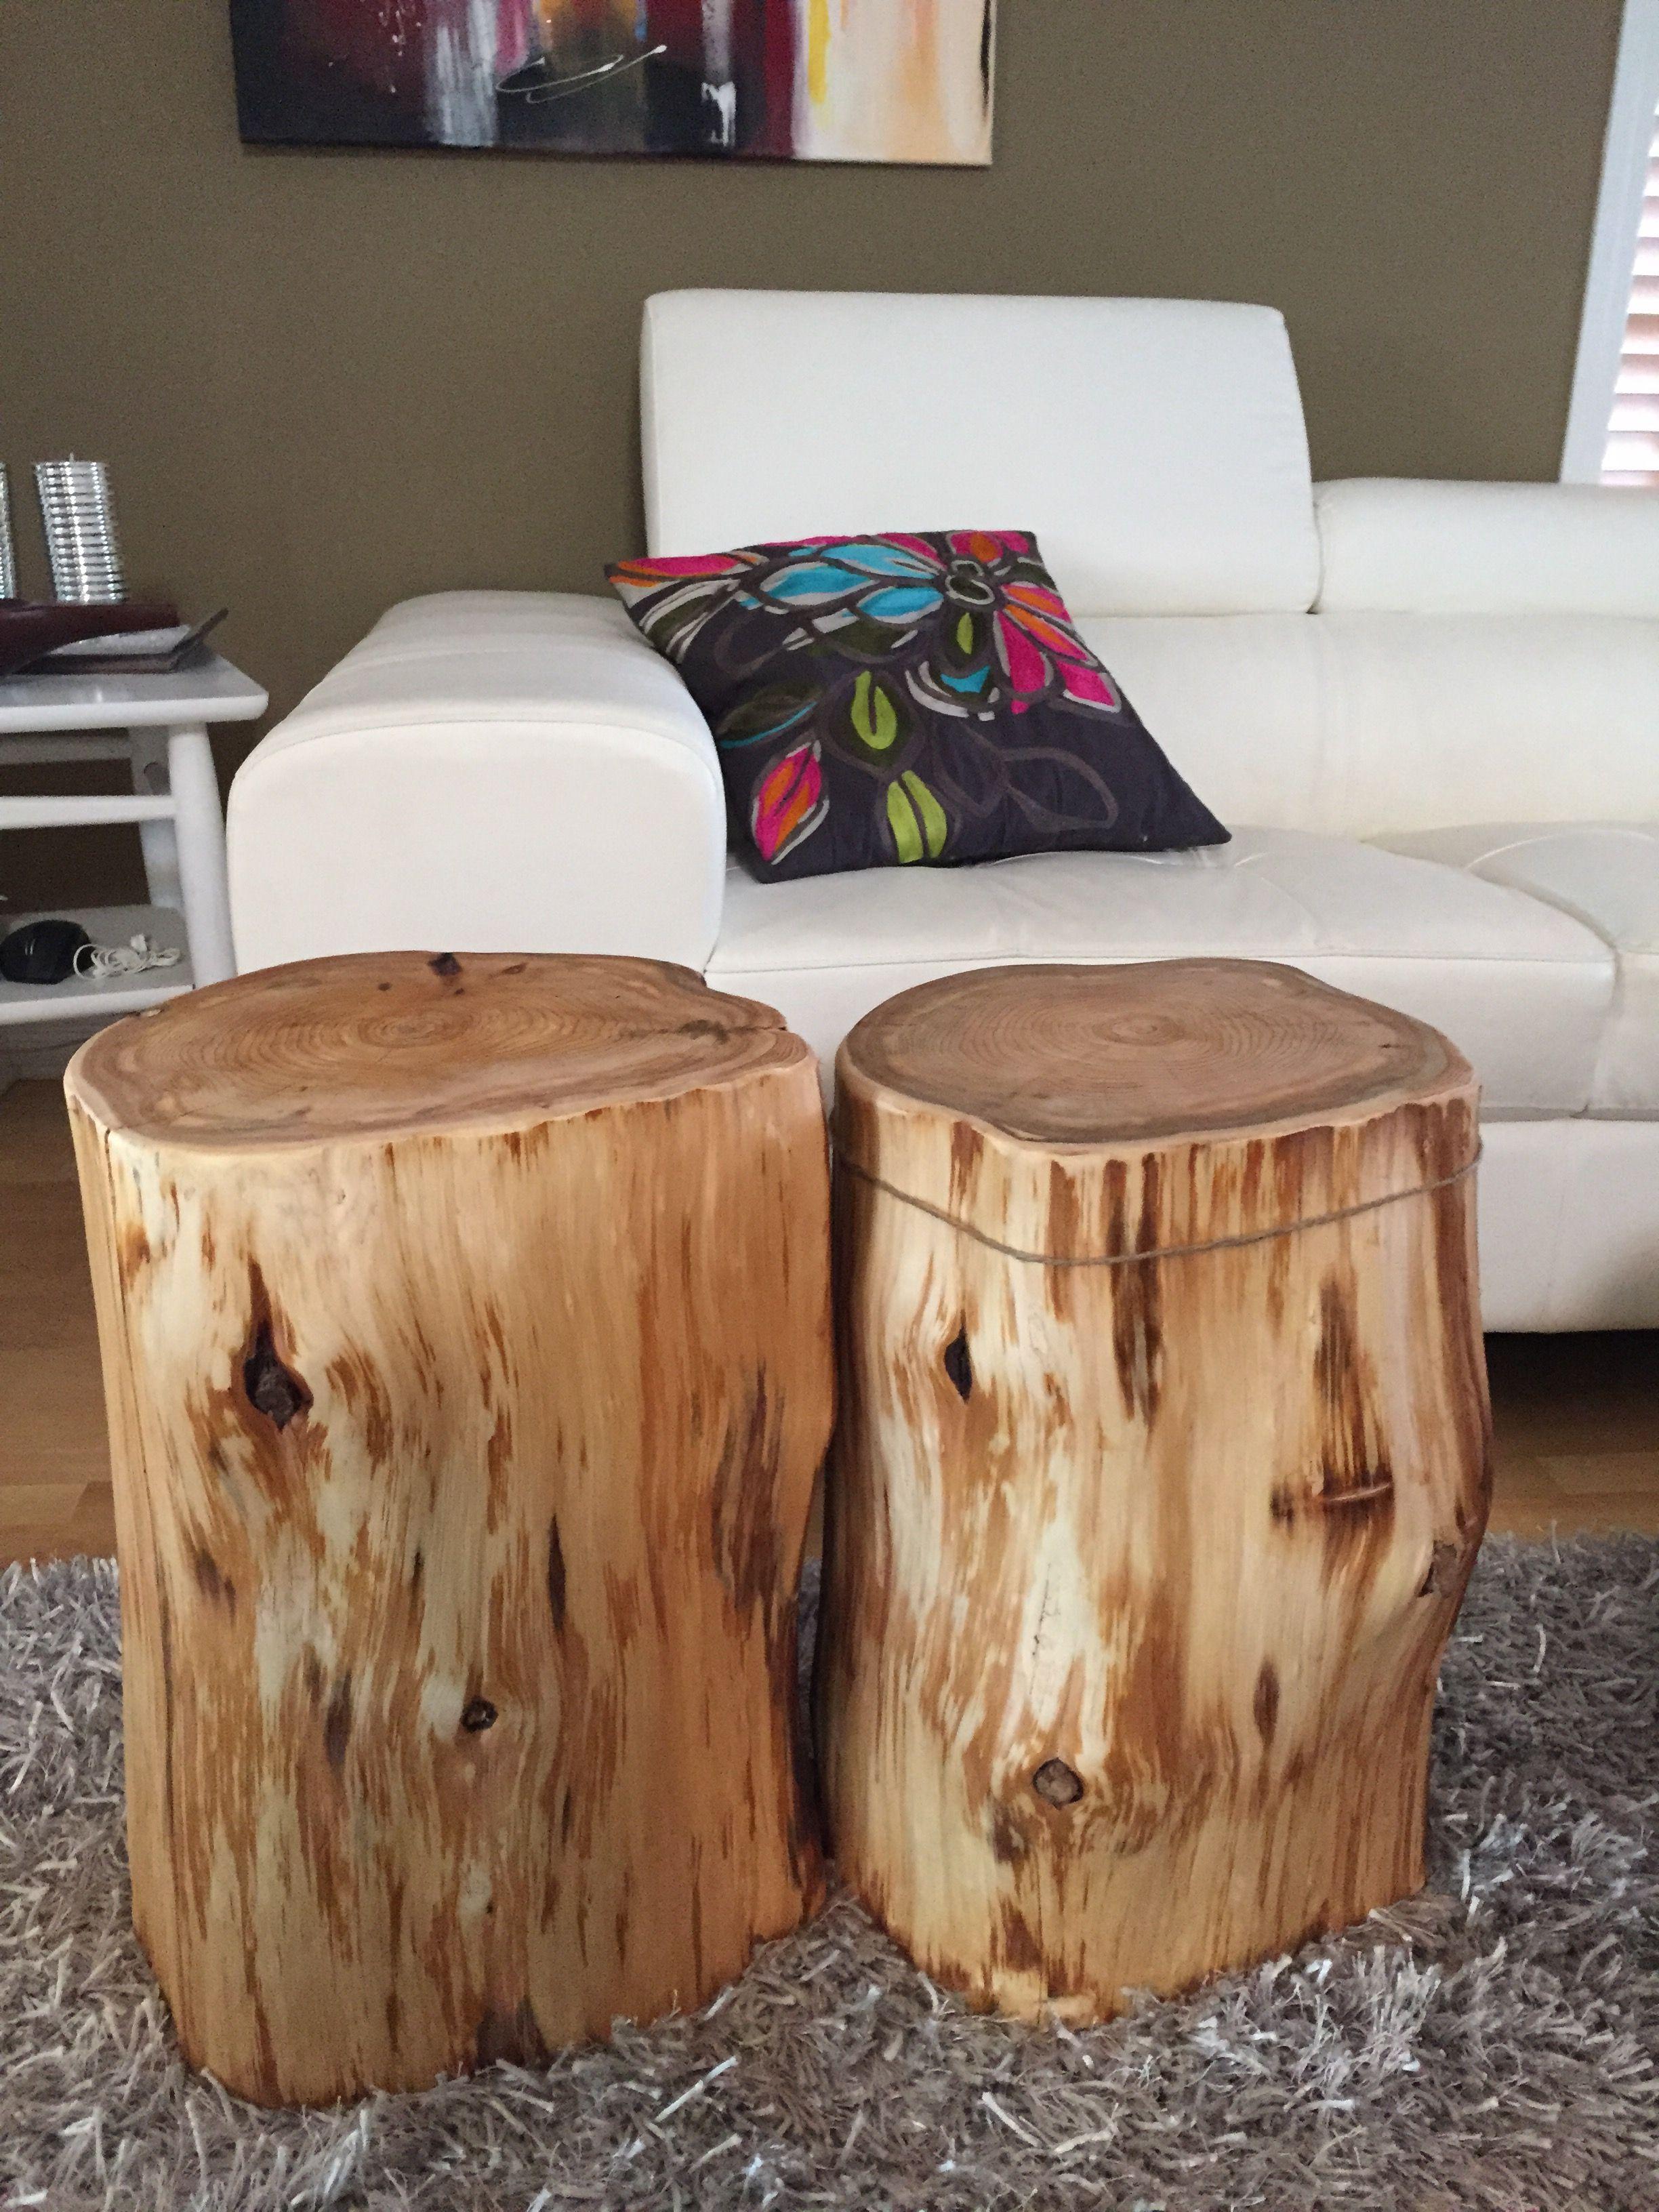 Rustic Tree Trunk Coffee Table Wooden Coffee Table Designs Coffee Table Farmhouse Coffee Table [ 1288 x 966 Pixel ]